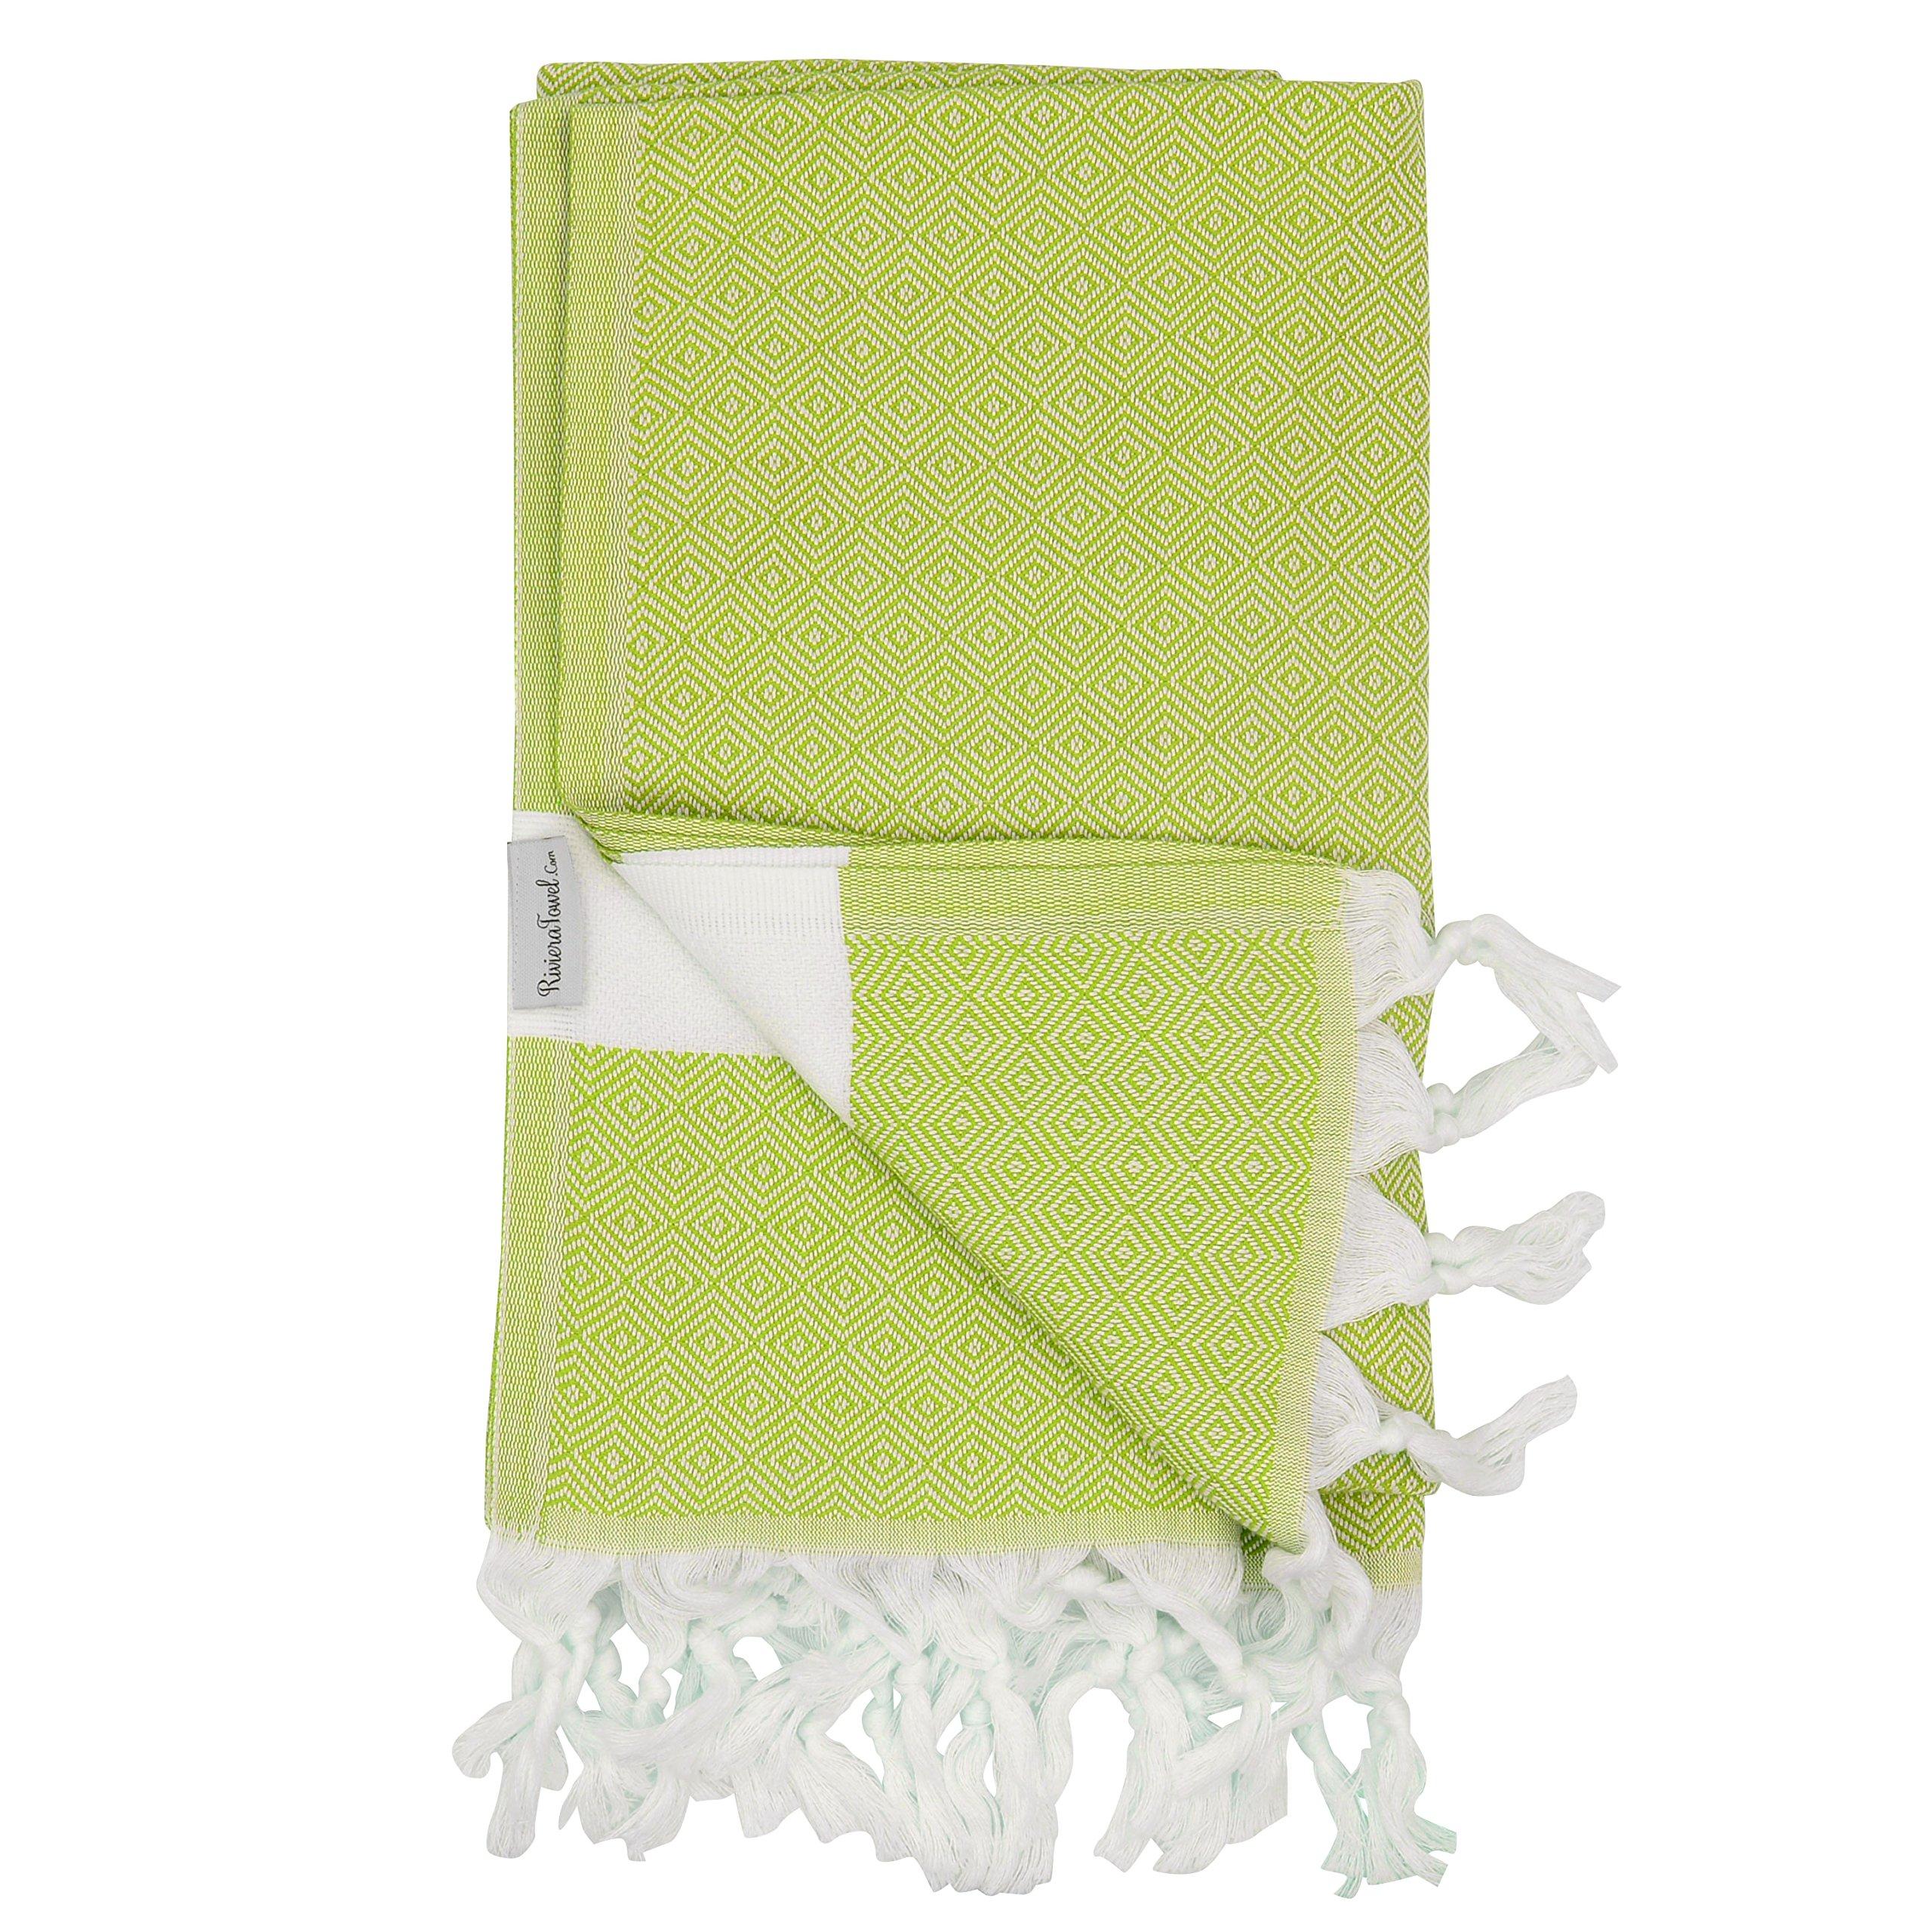 Lime Diamond Turkish Towel - Naturally Dyed 100% Cotton - 70x39 inches - Beach Bath Pool Yoga Pilates Picnic Blanket Scarf Wrap Hammam Fouta Turkish Bath Towels Peshtemal